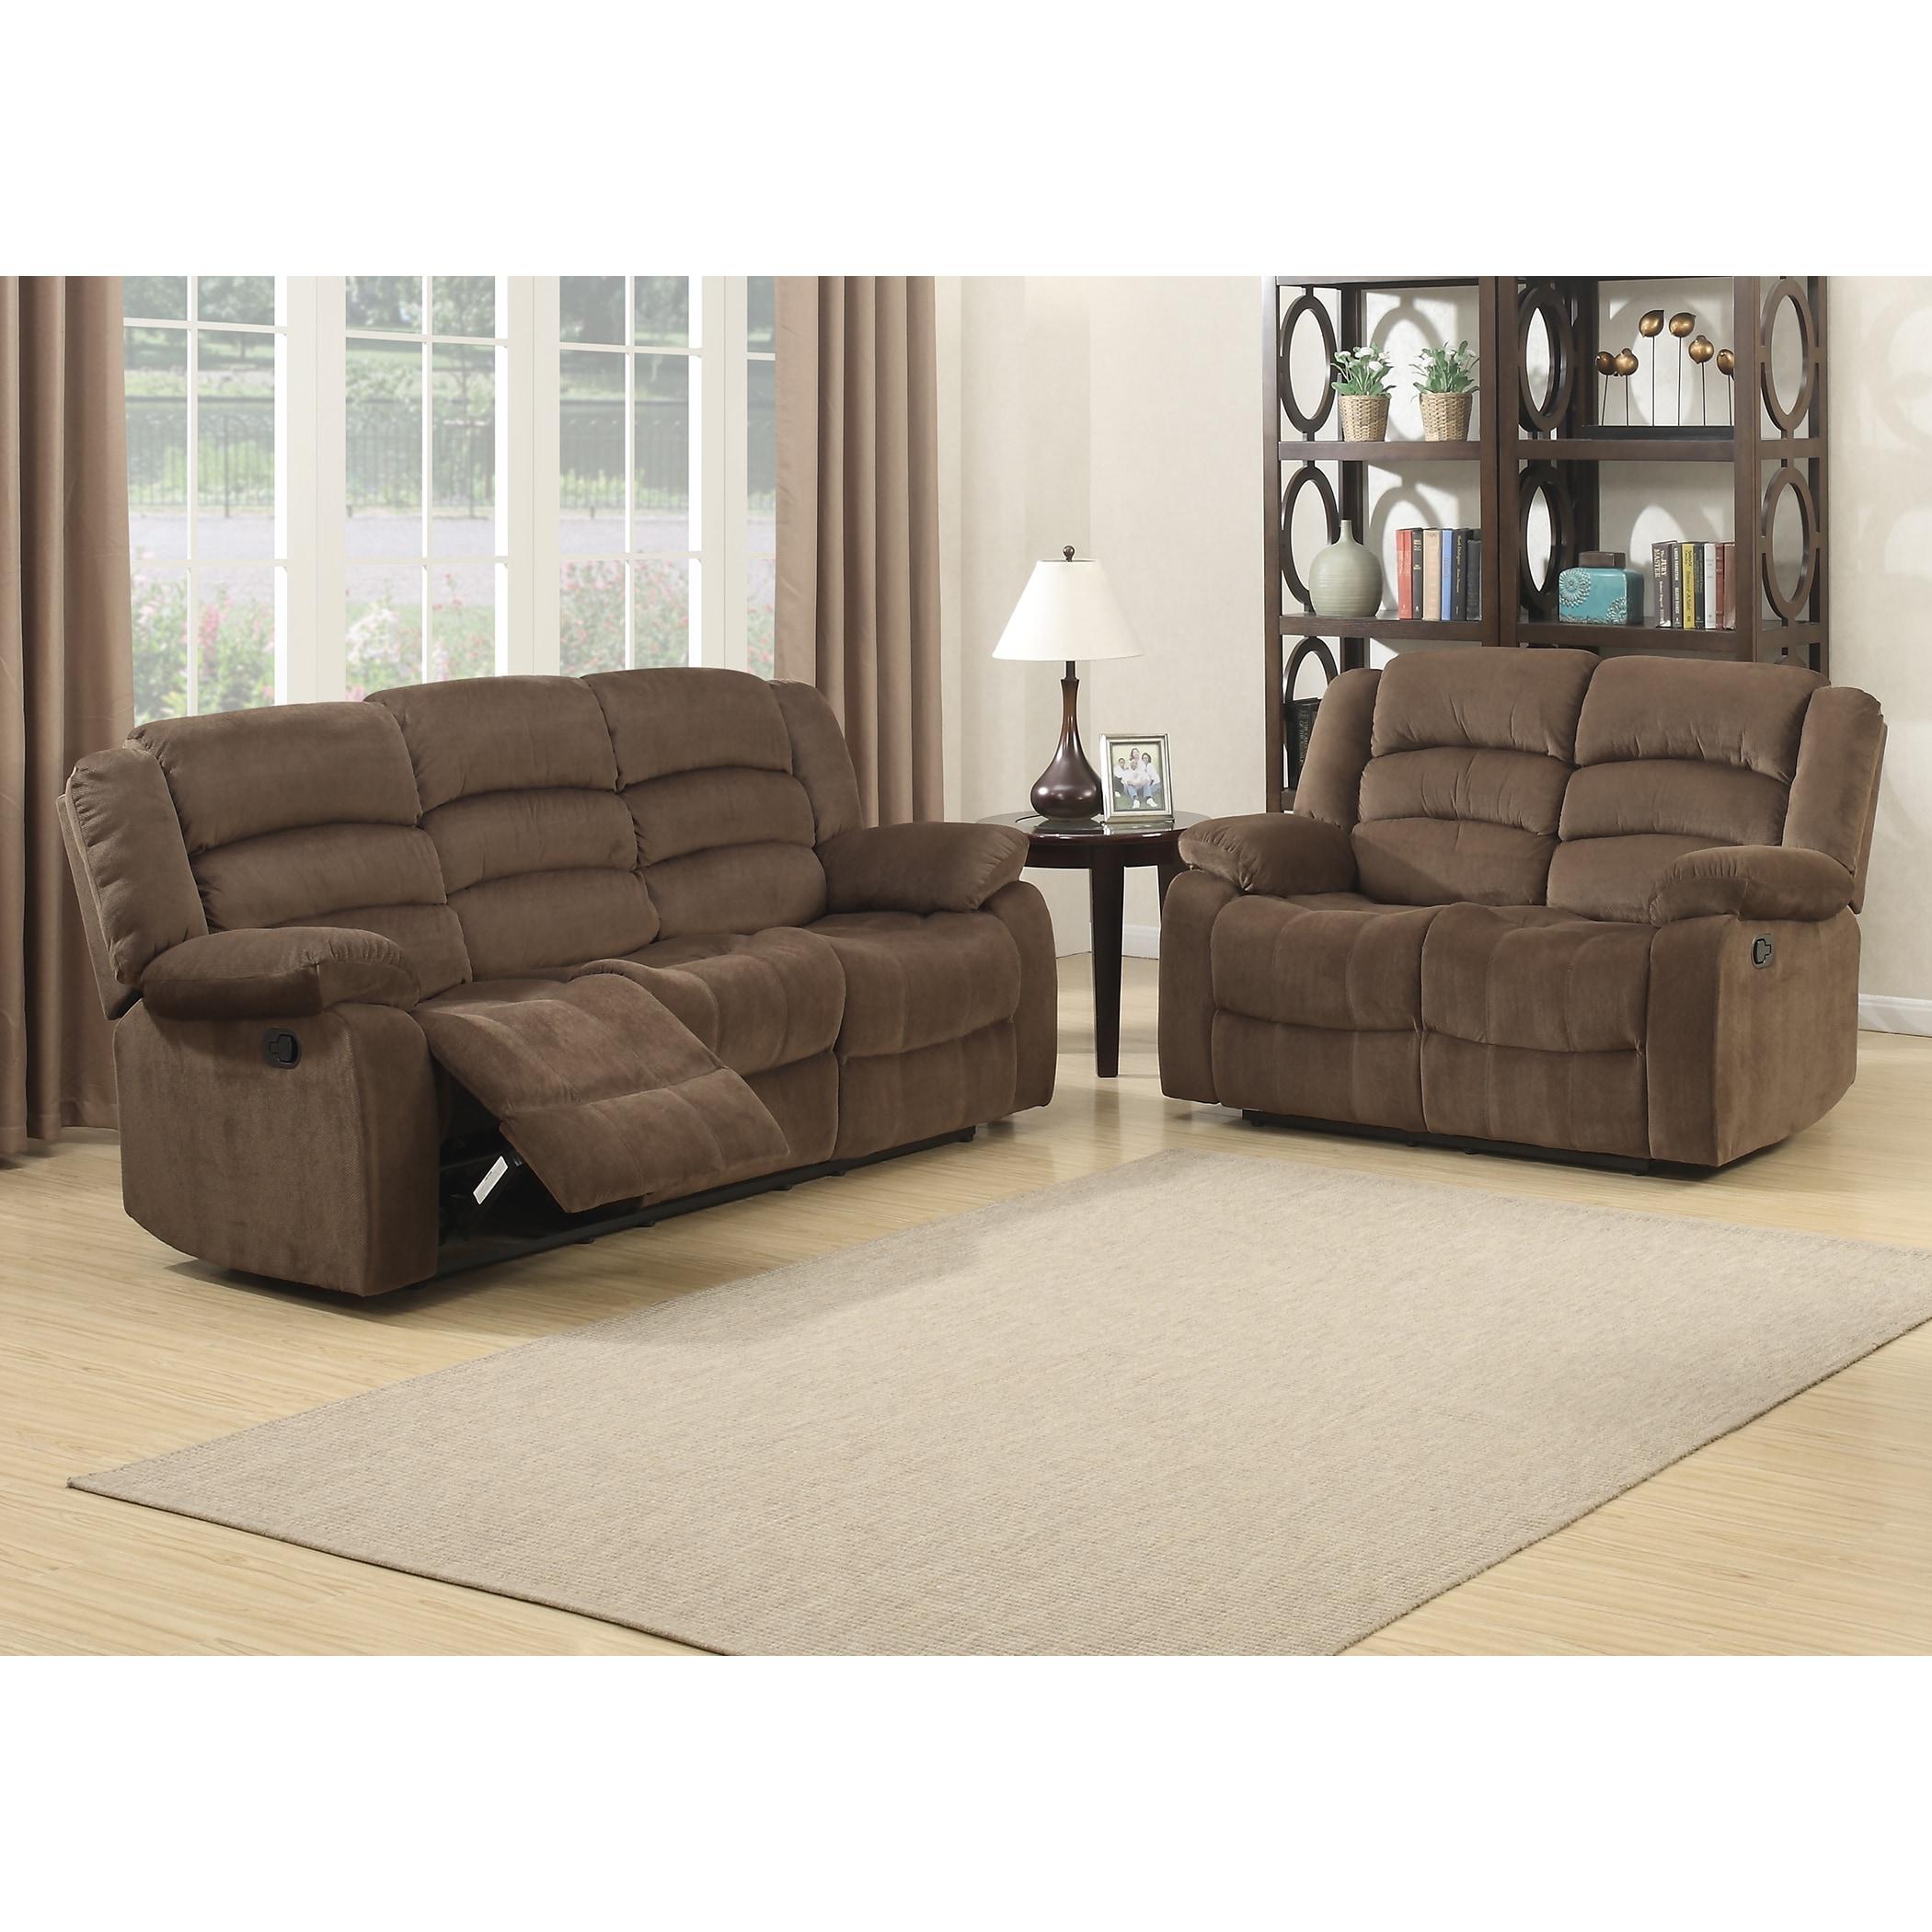 Bill 2 Piece Contemporary Brown Reclining Living Room Set Overstock 12637215